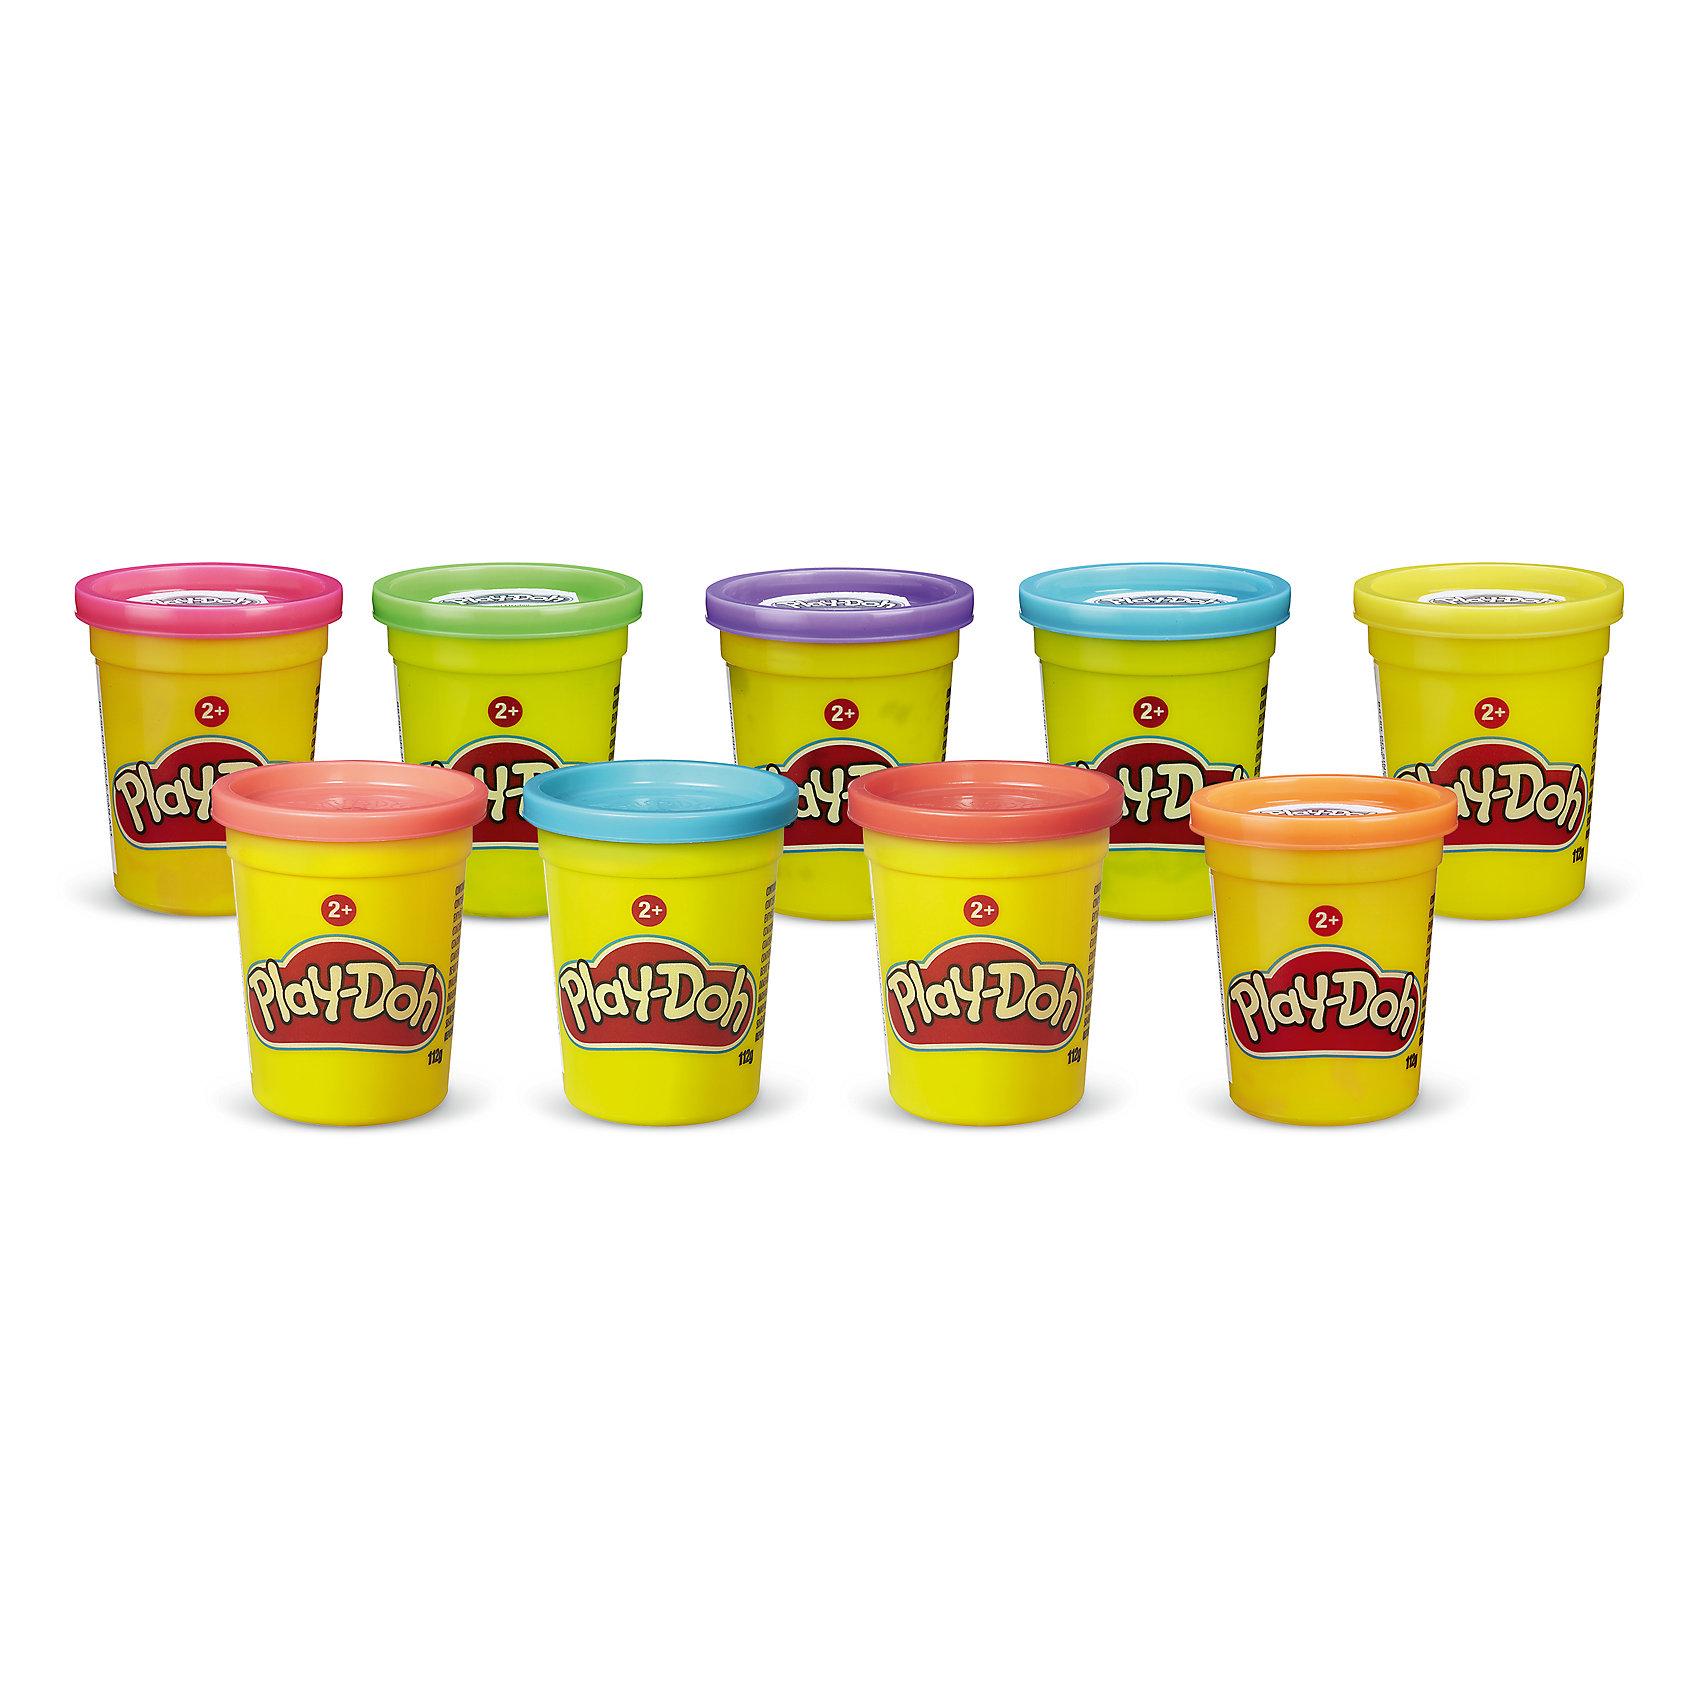 Play-Doh Пластилин 1 банка в ассортименте